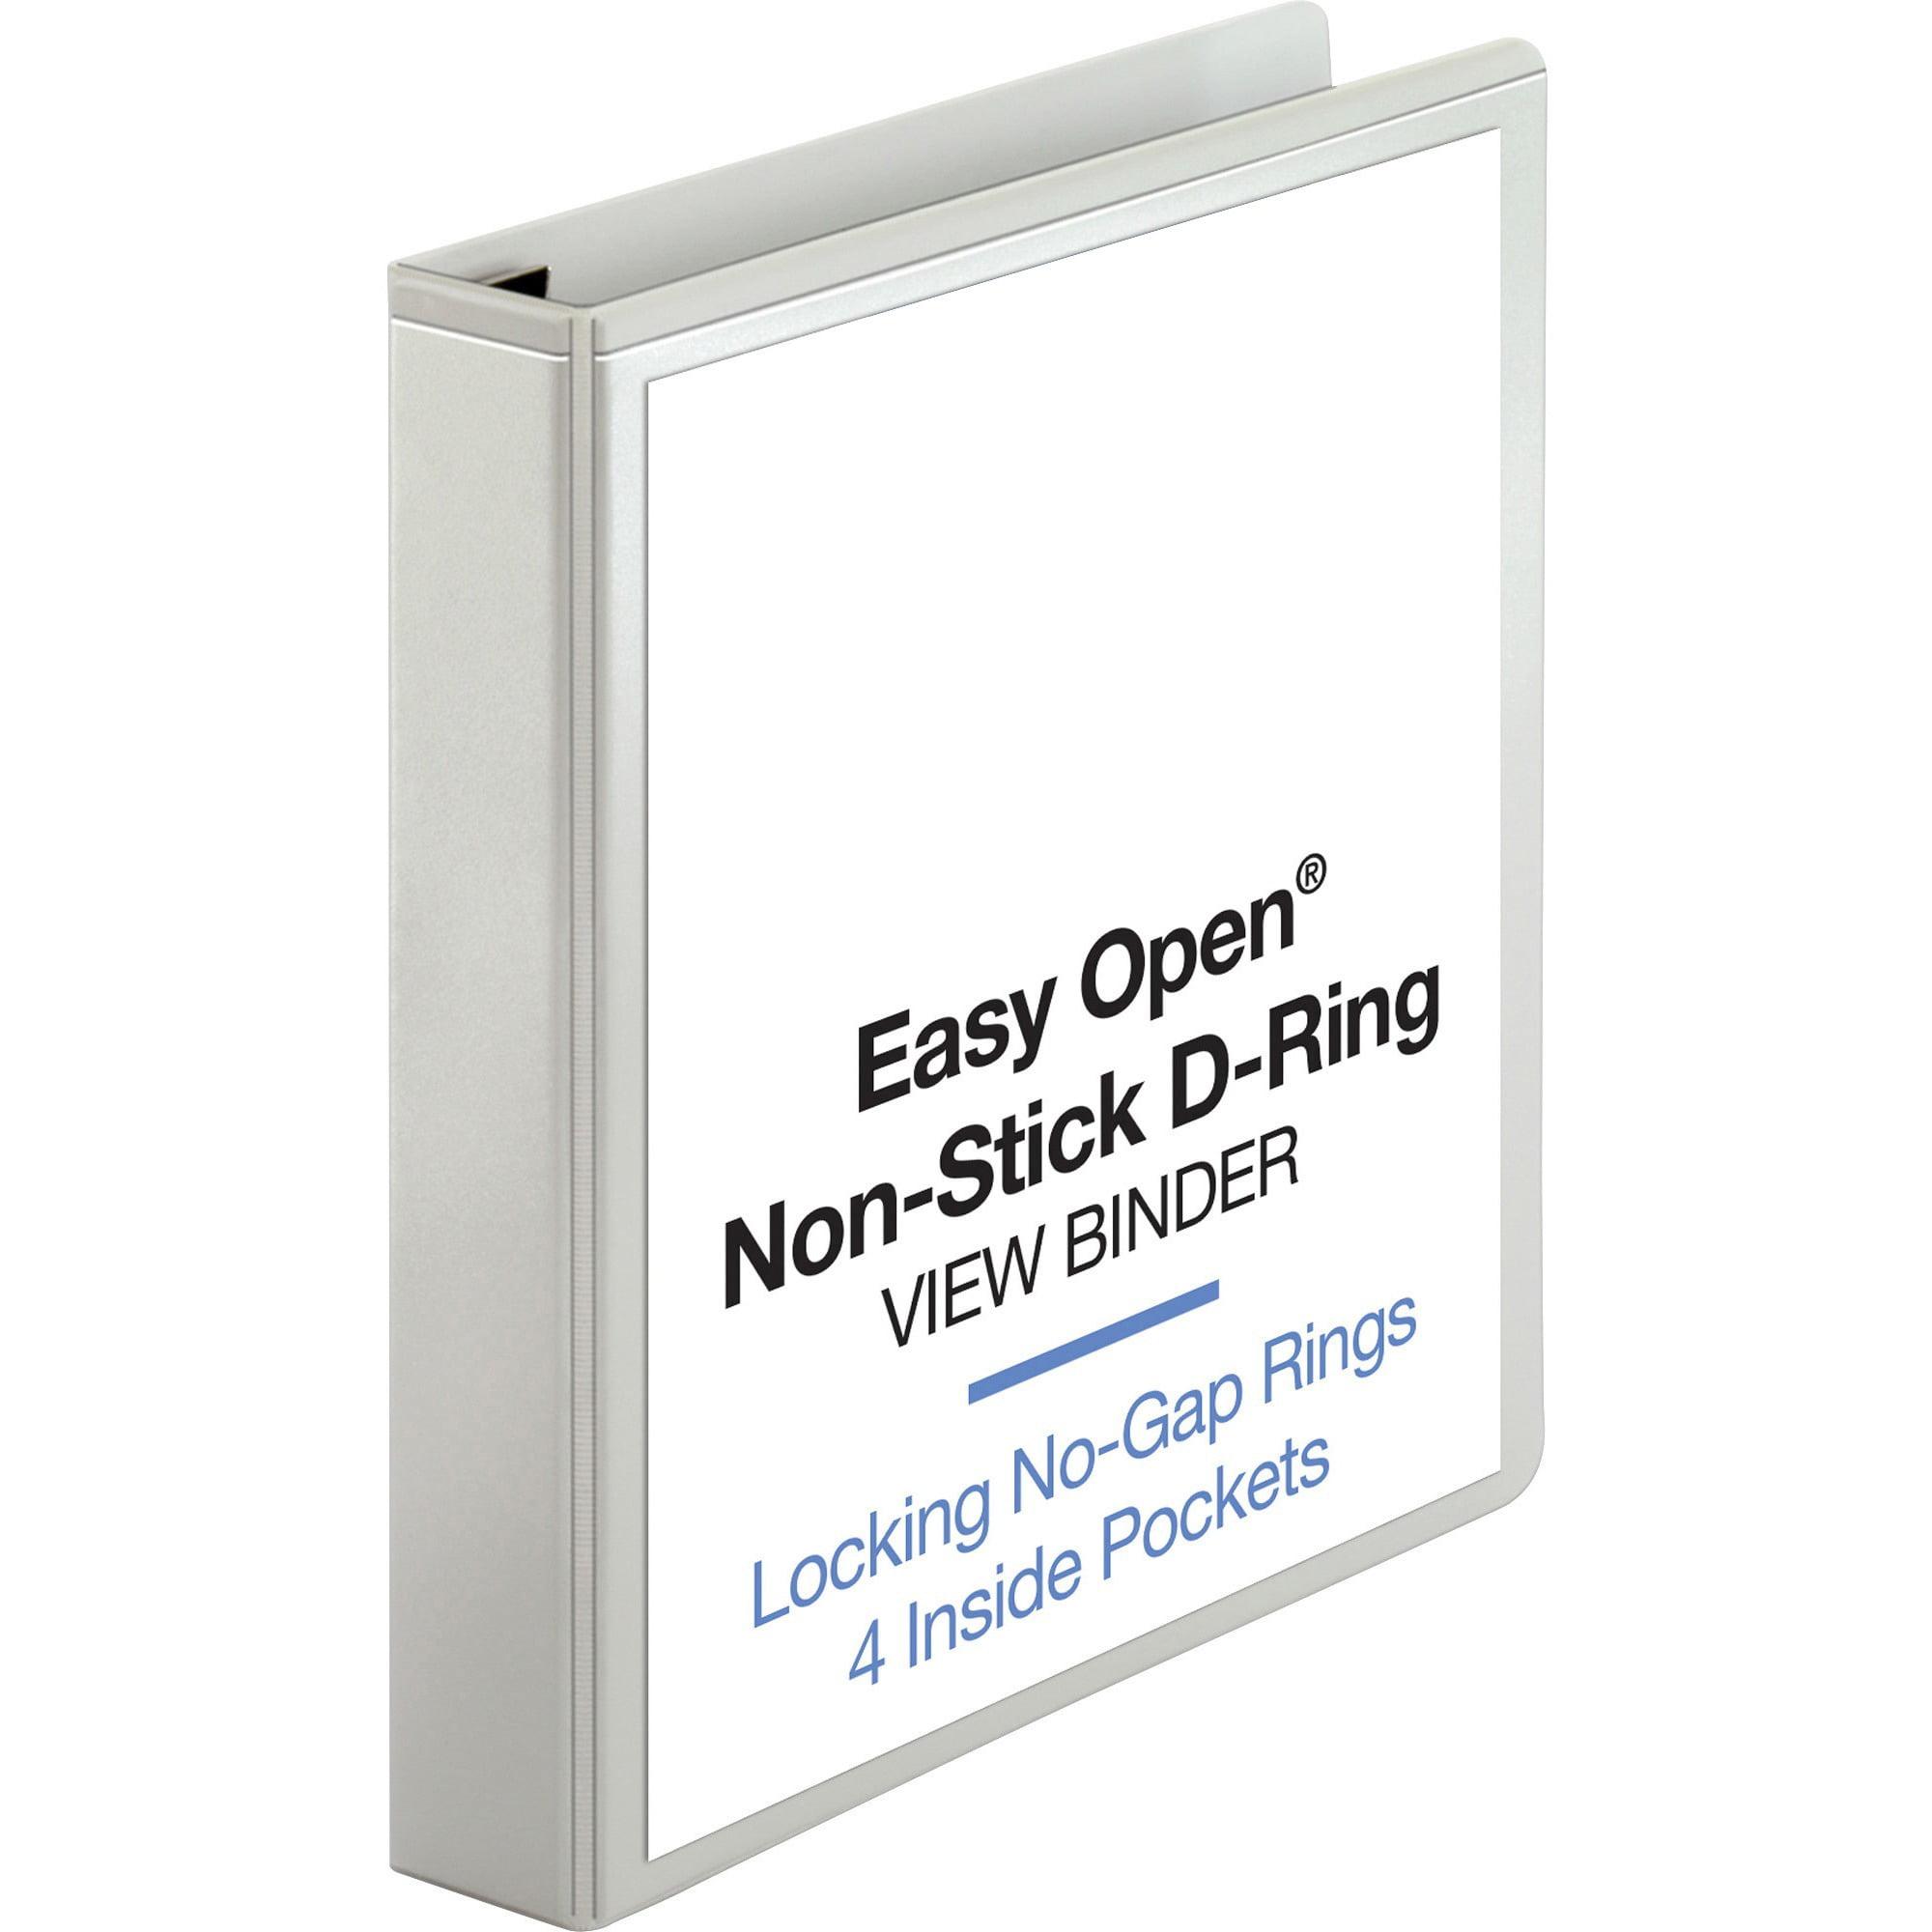 Business Source, BSN26957, Locking D-Ring View Binder, 1 Each, White